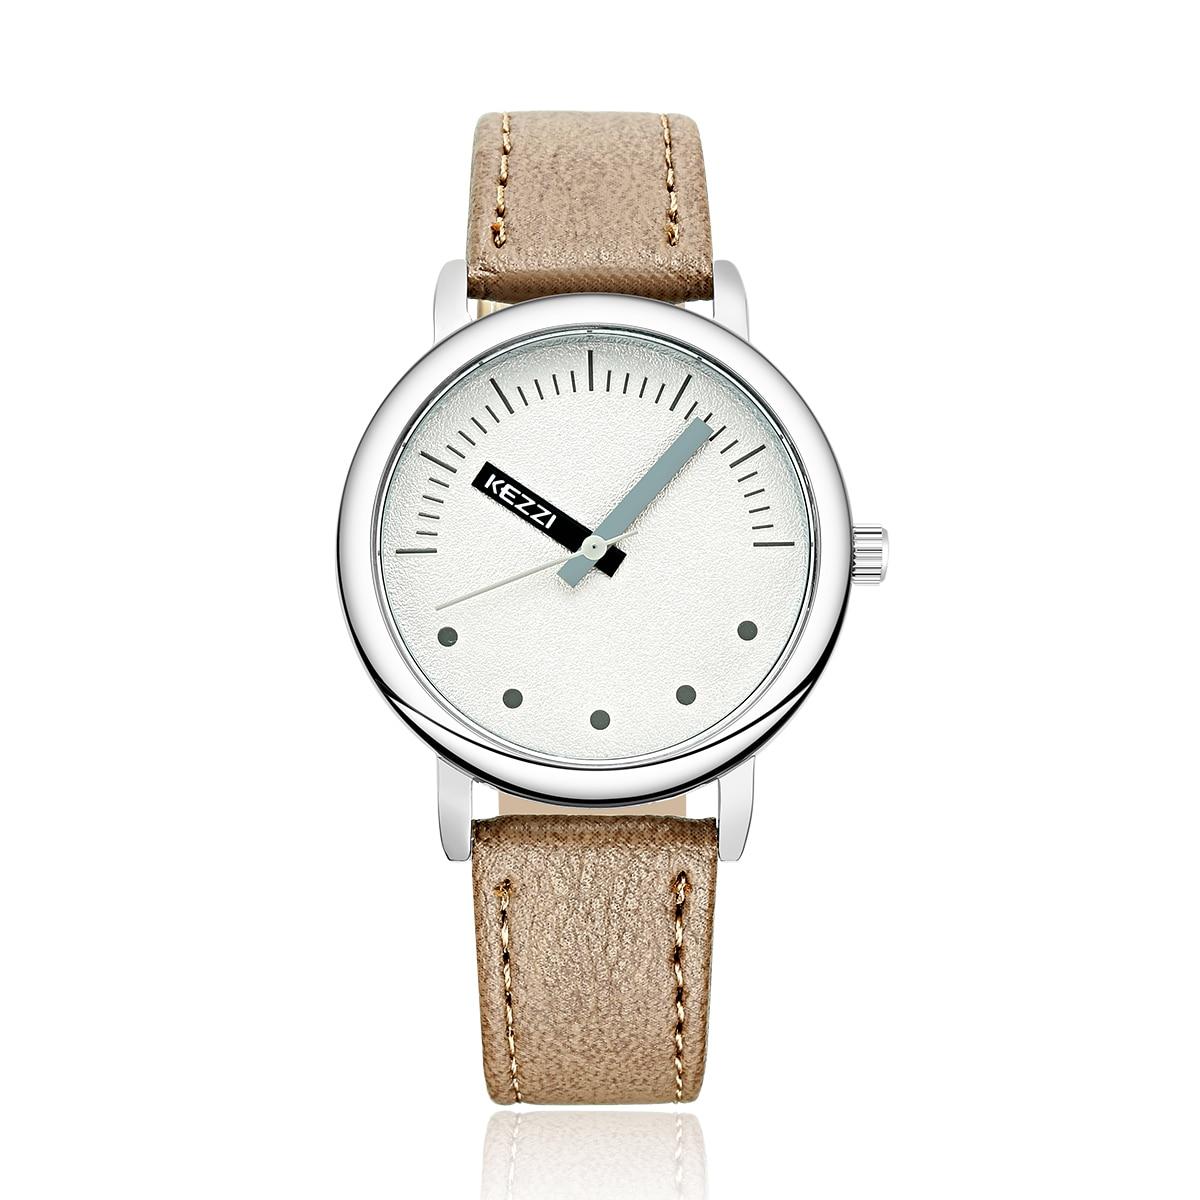 NO.2 Brand Woman Bracelet Watches Ladies Roman Numeral Stainless Steel Quartz Dress watches femal wristwatches